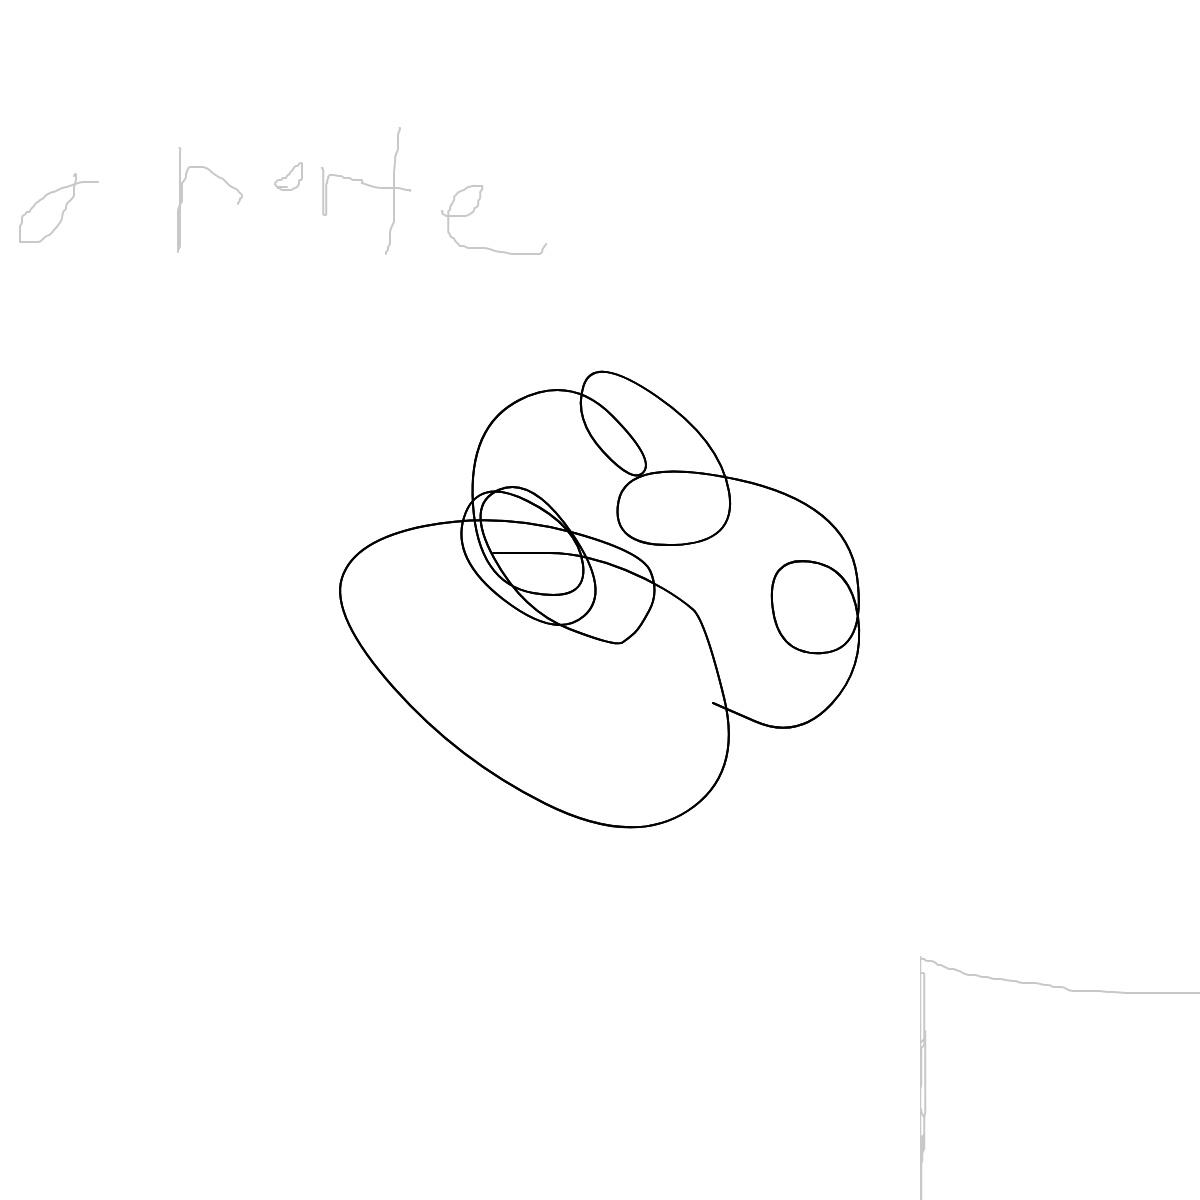 BAAAM drawing#23390 lat:54.5877609252929700lng: -5.9347400665283200